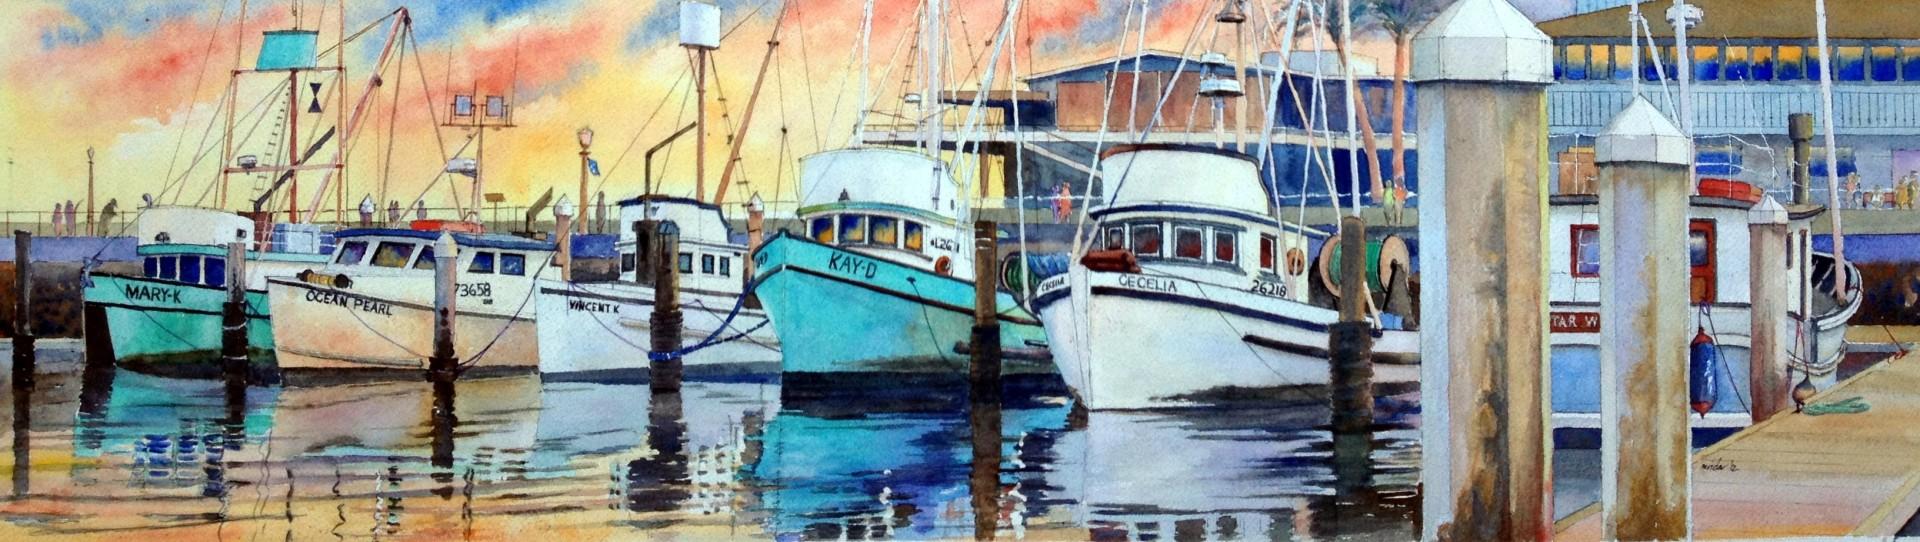 Santa Barbara Fishing Fleet